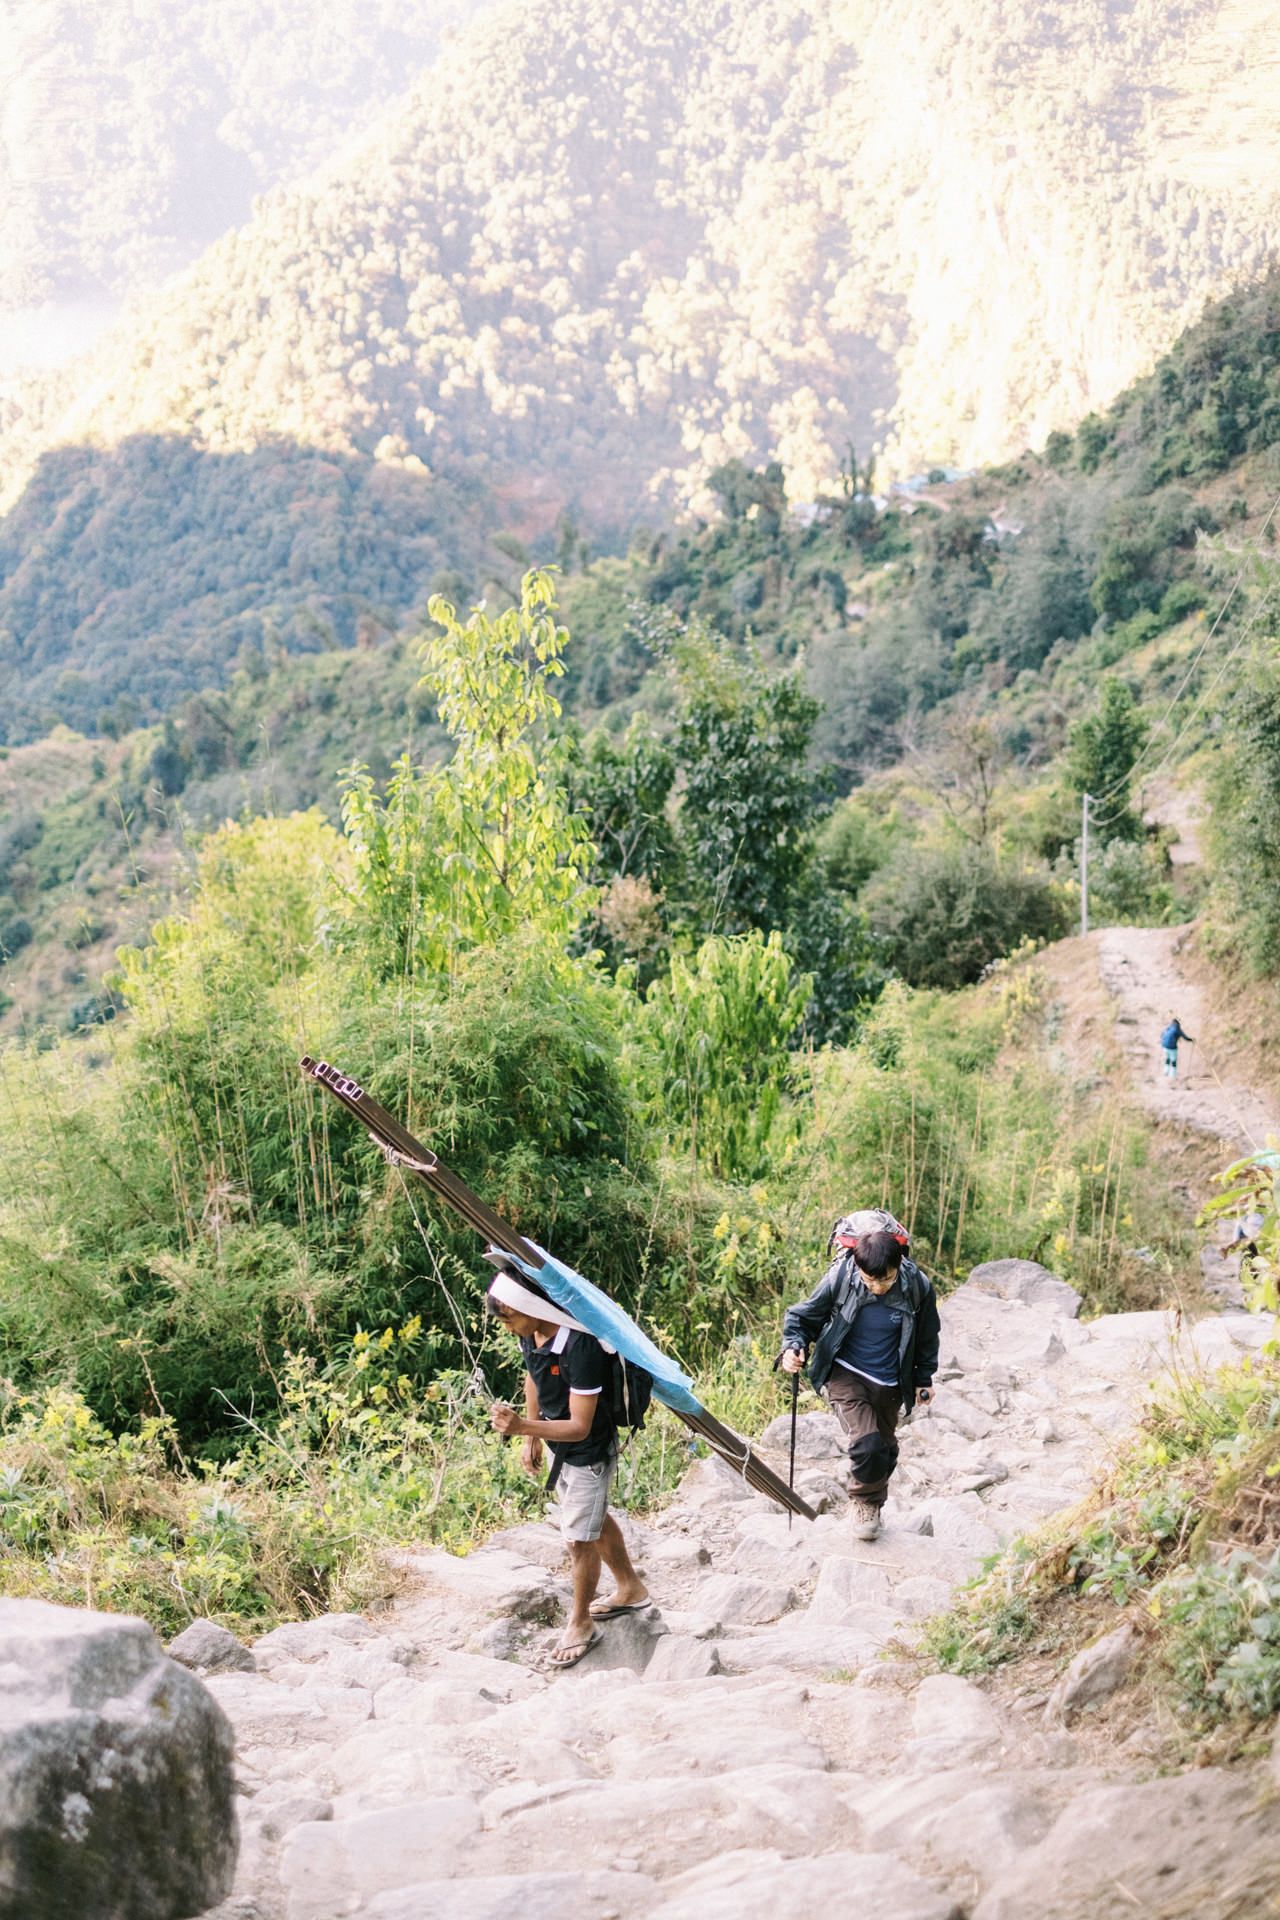 Nepal 2019 - Trekking Annapurna Base Camp 140